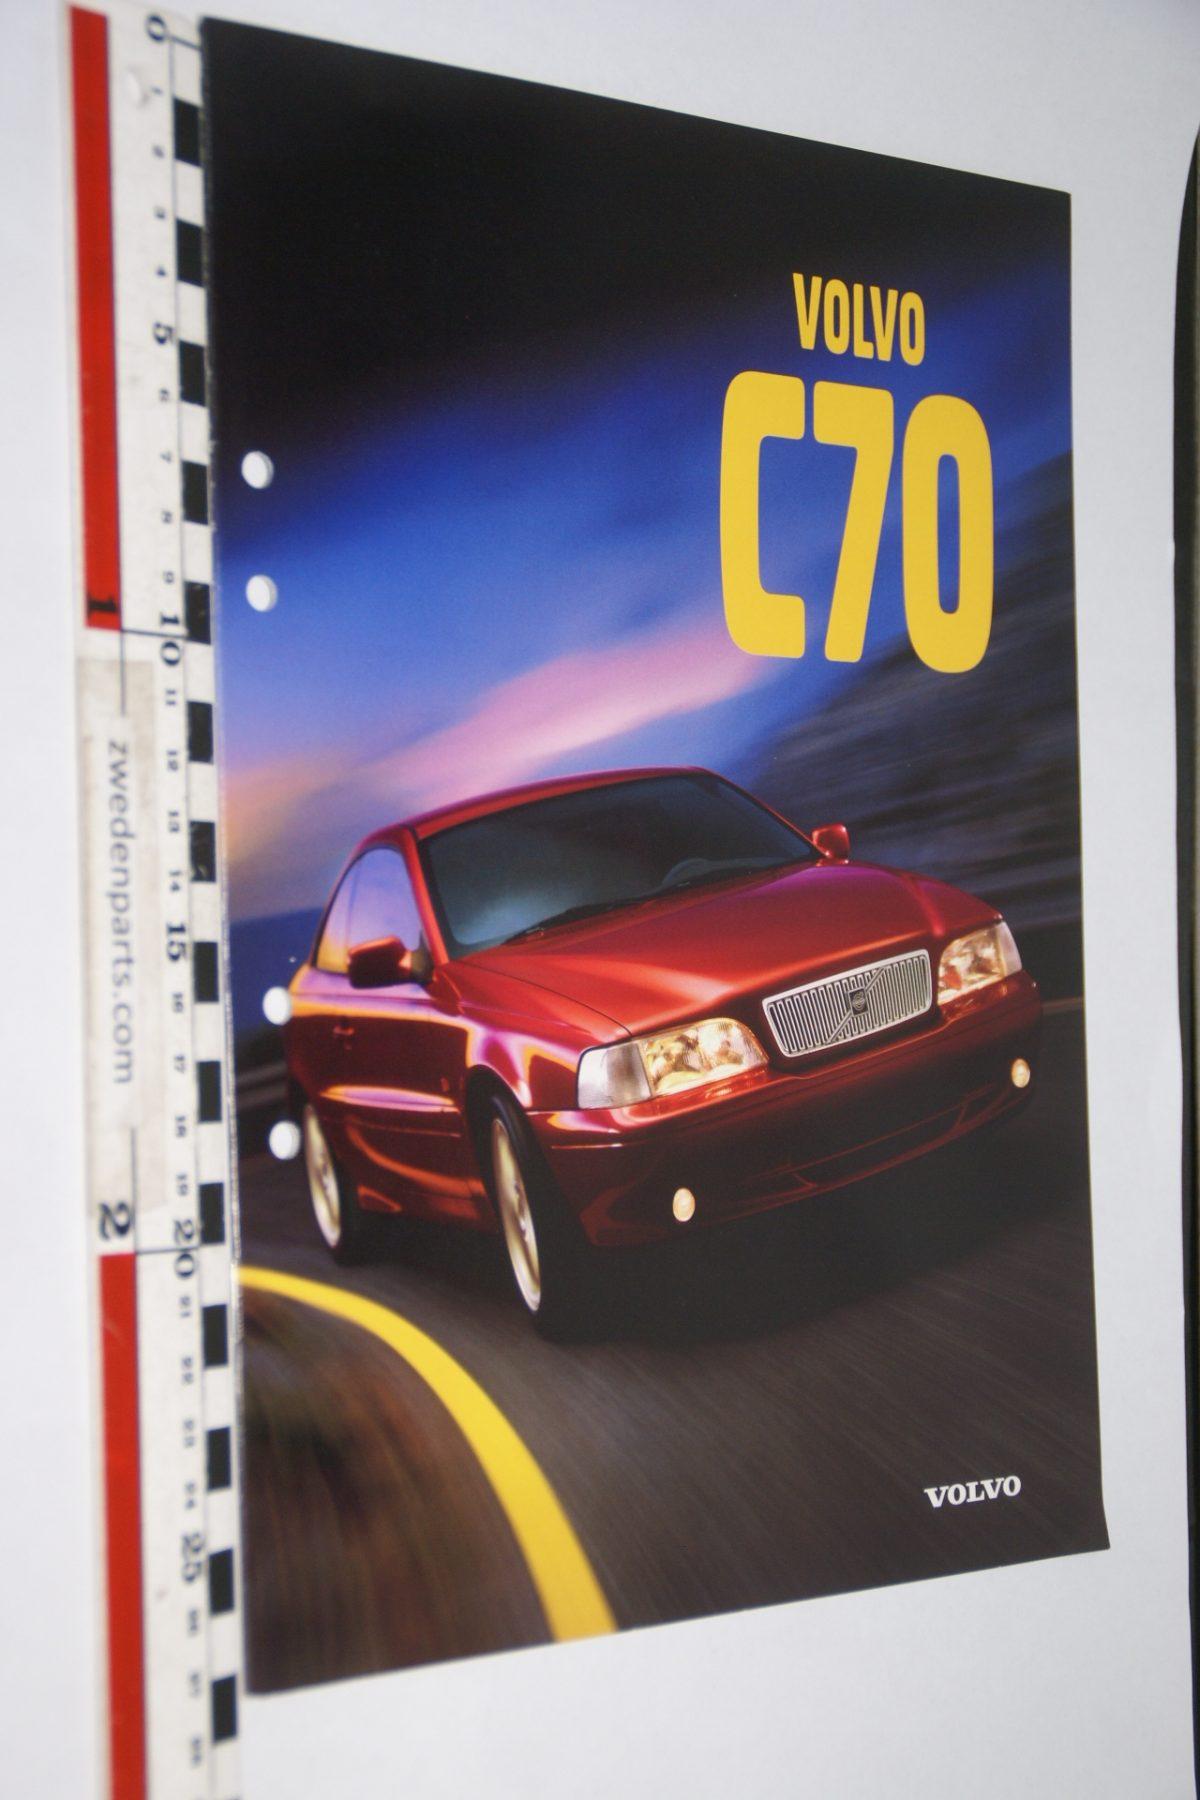 DSC06300 1997 brochure Volvo C70 nr MSPV 8651-97, English